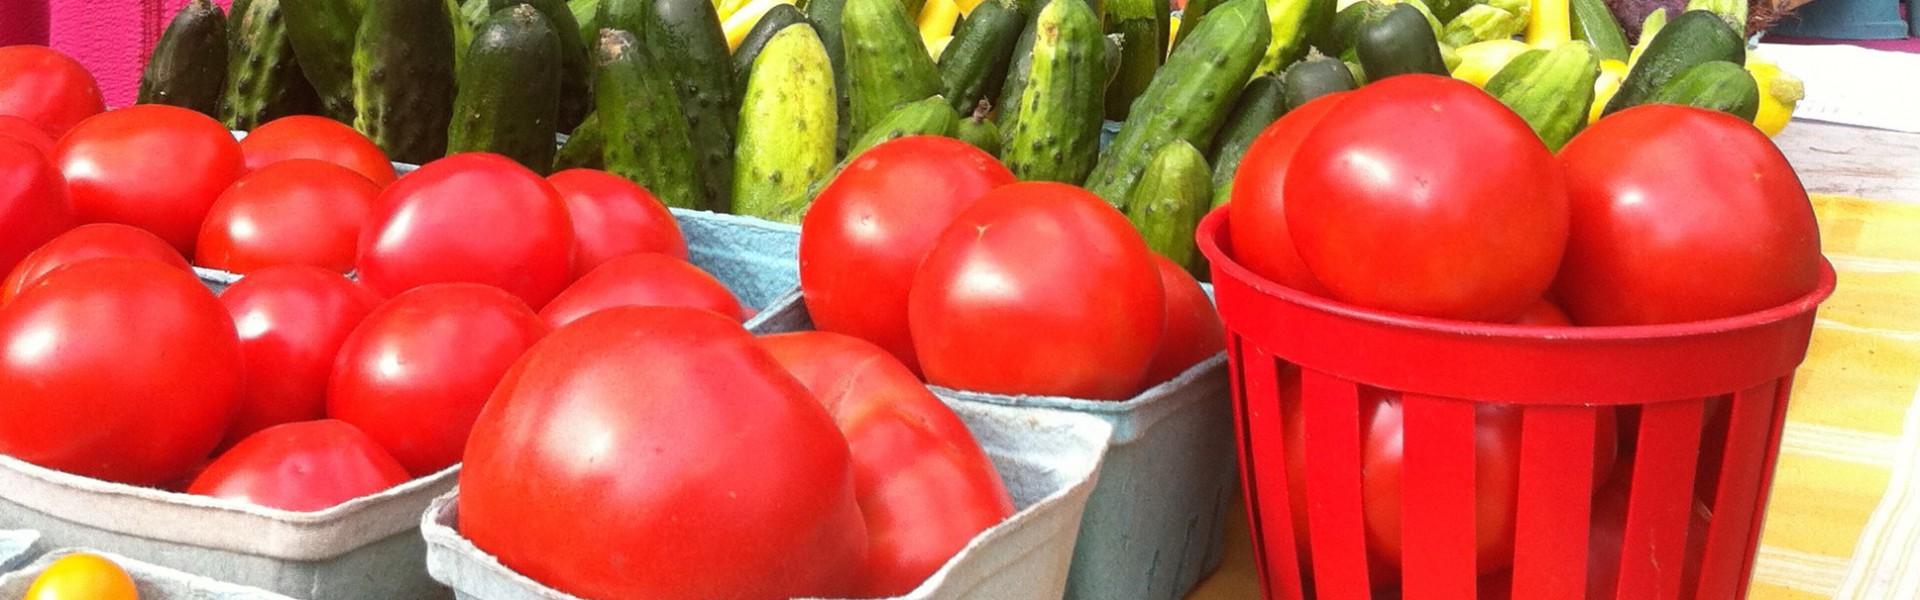 Lève-tôt Organic Farm